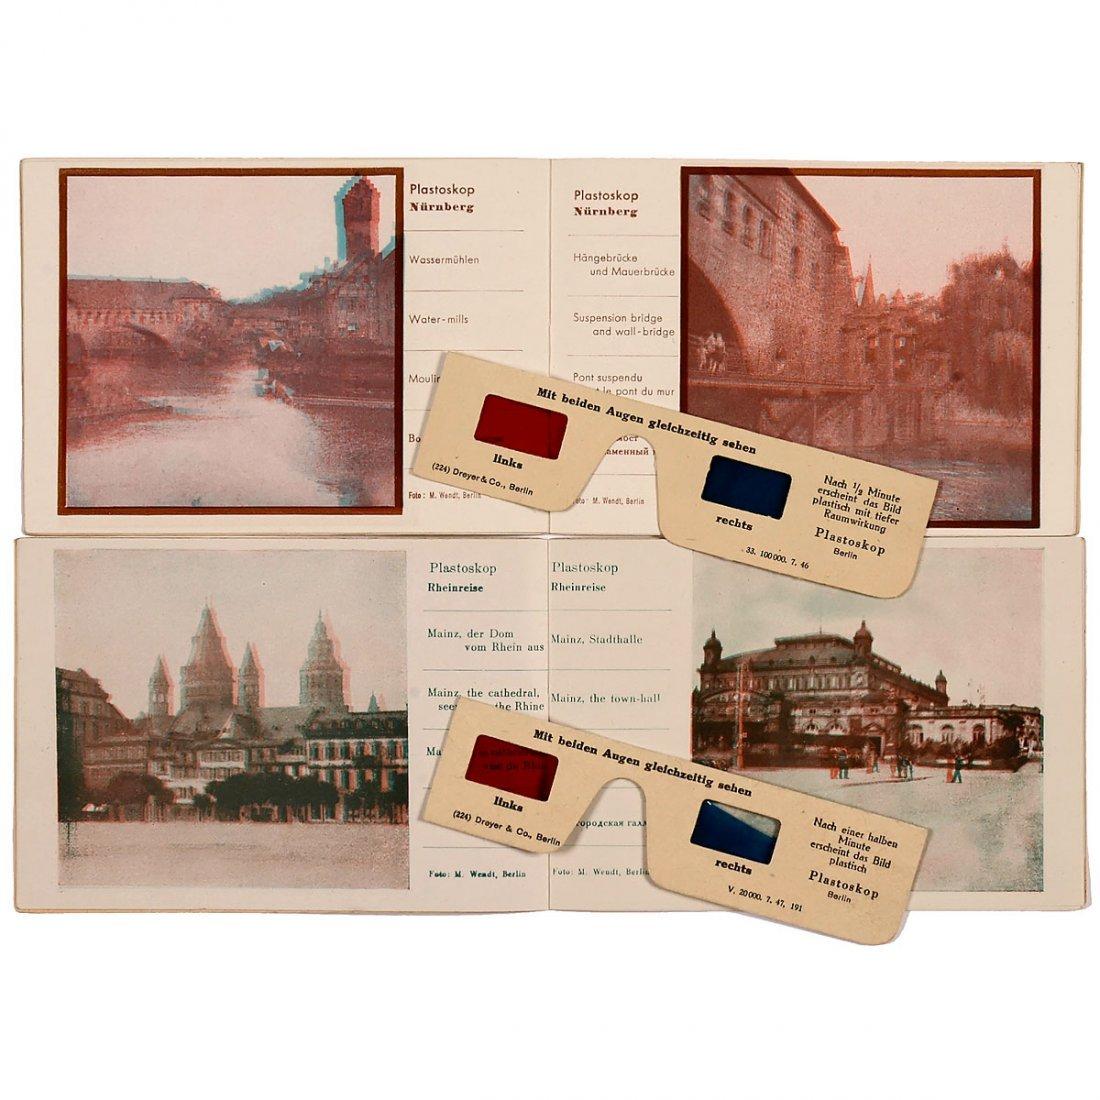 2 Plastoscope Raumbilder Booklets, c. 1947